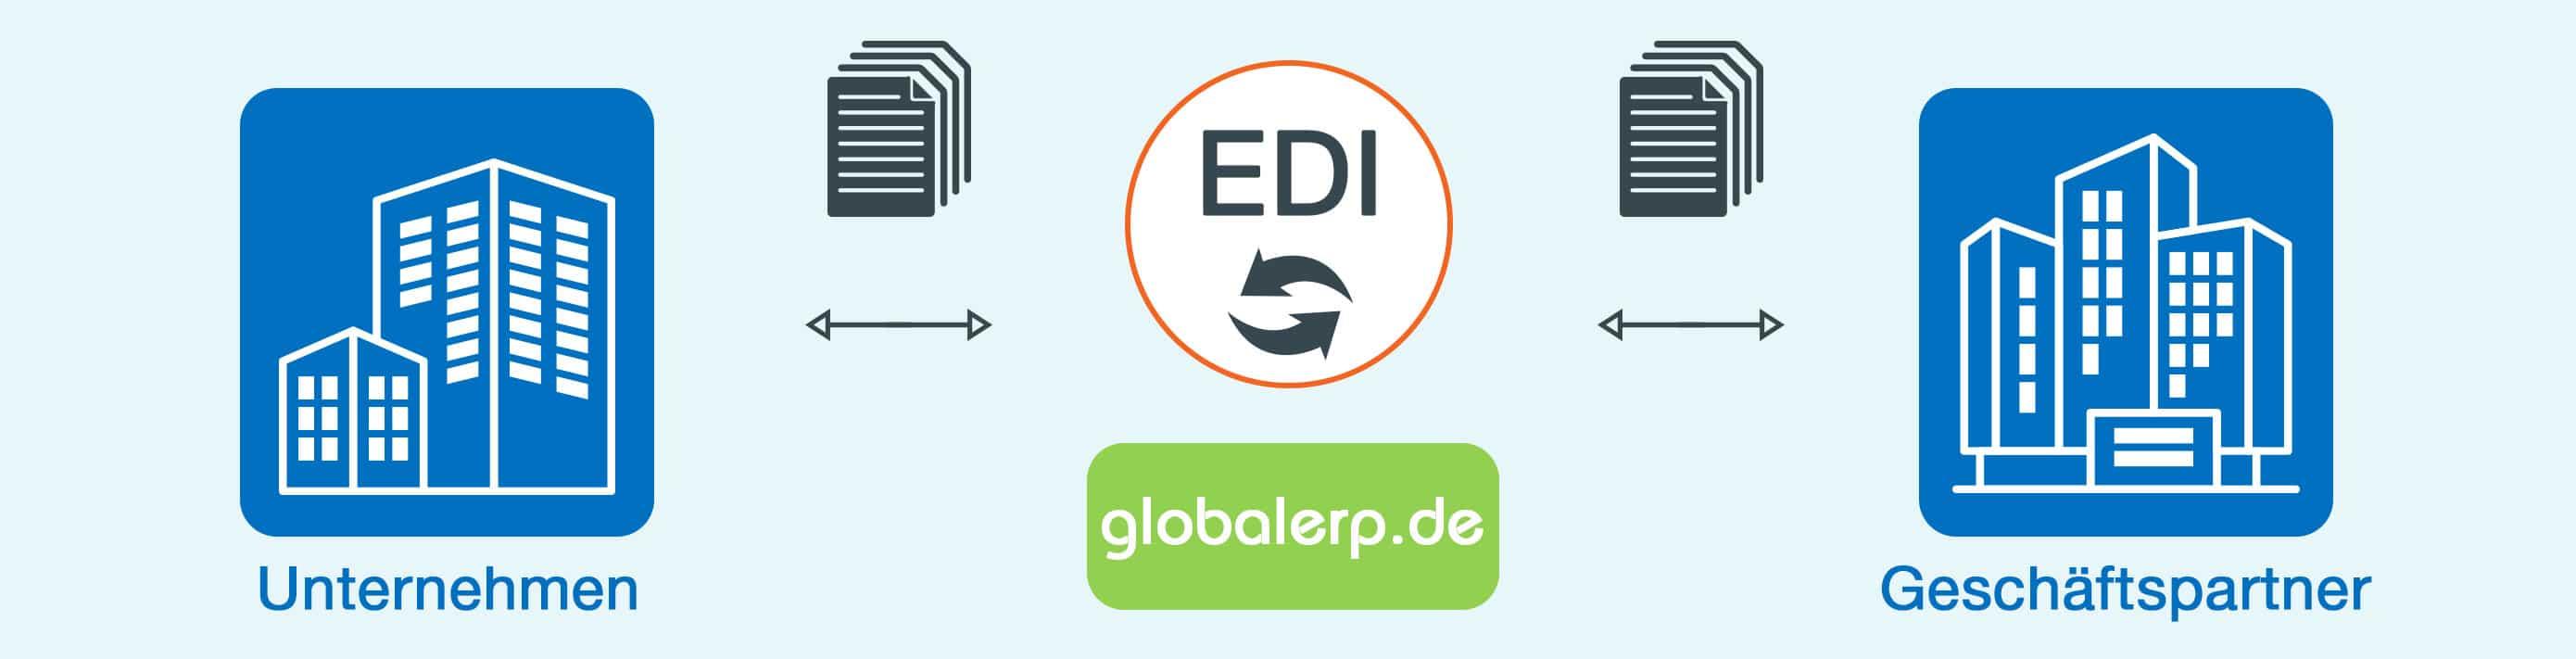 EDI Computer-zu-Computer-Austausch